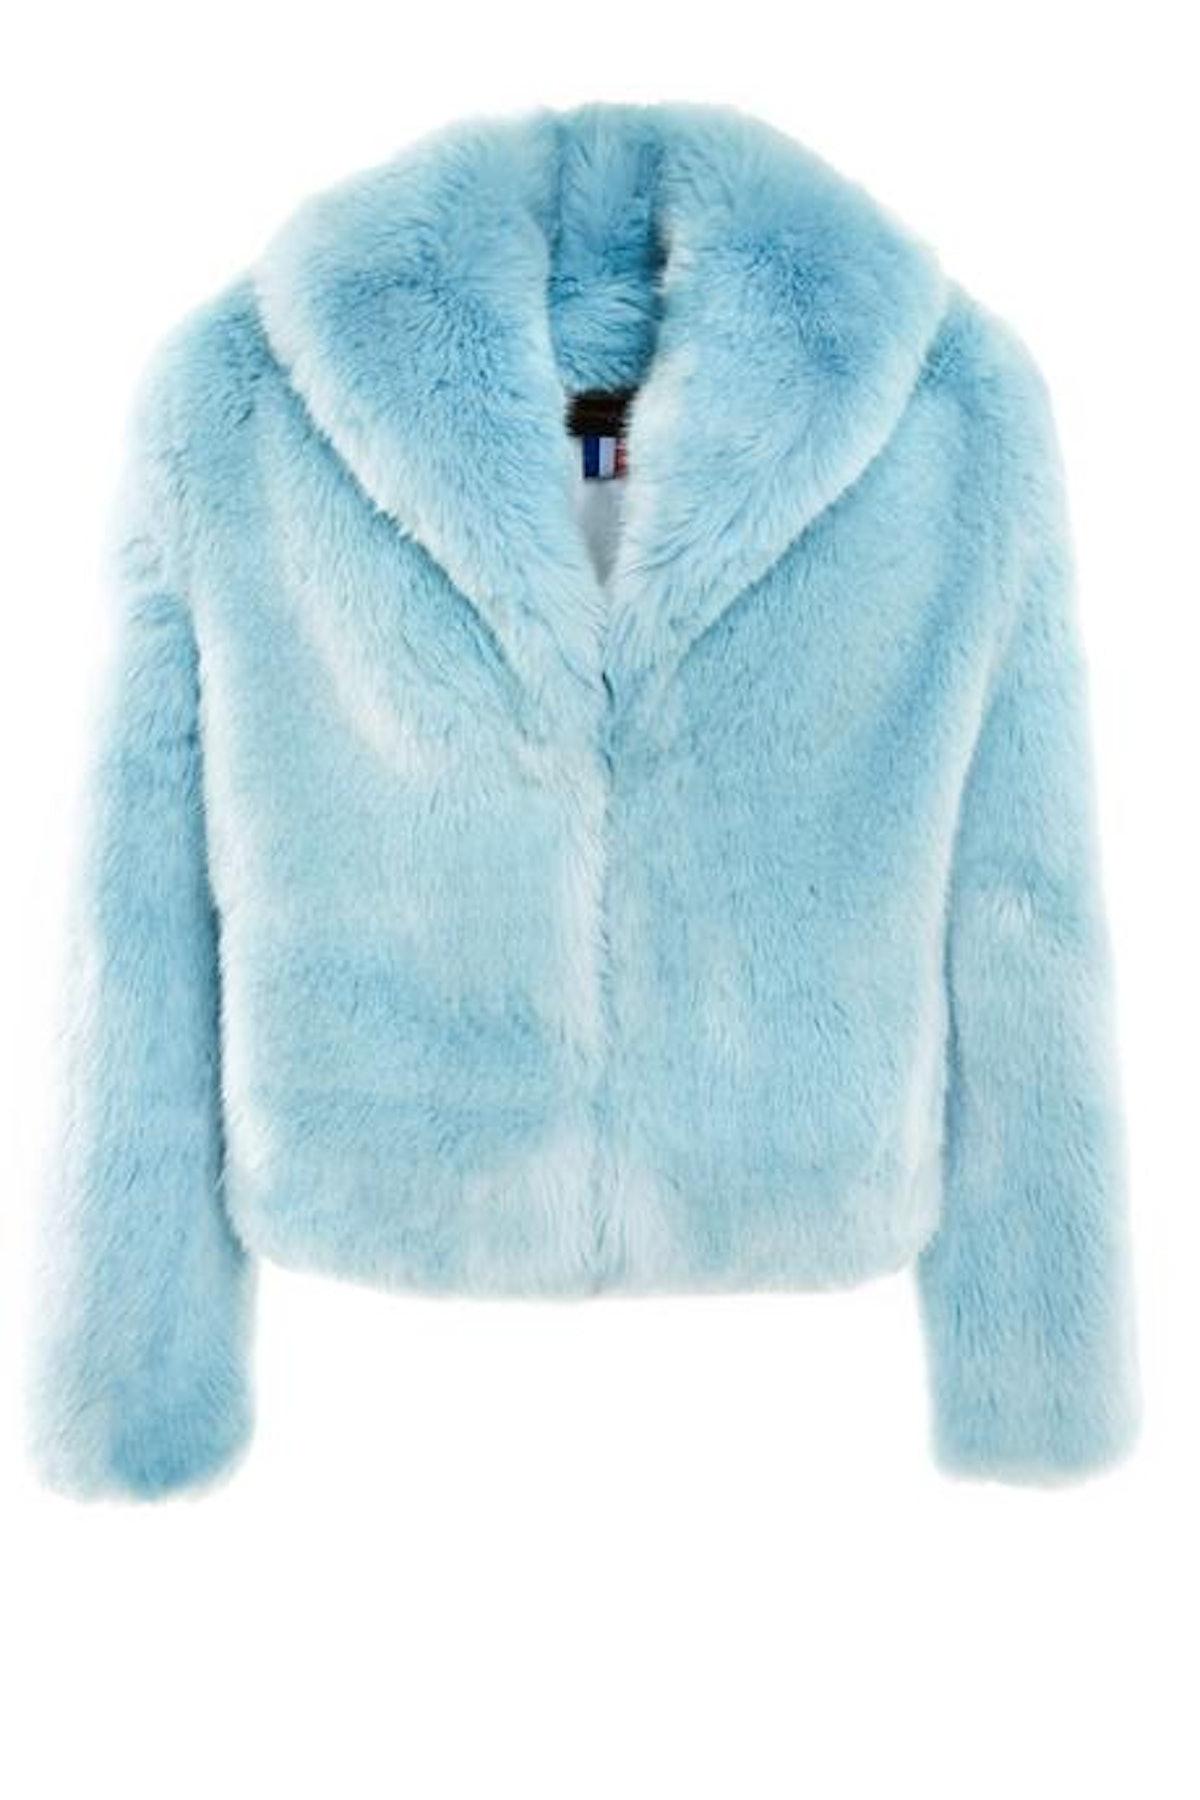 Erelle Blue Heaven Faux Fur Jacket